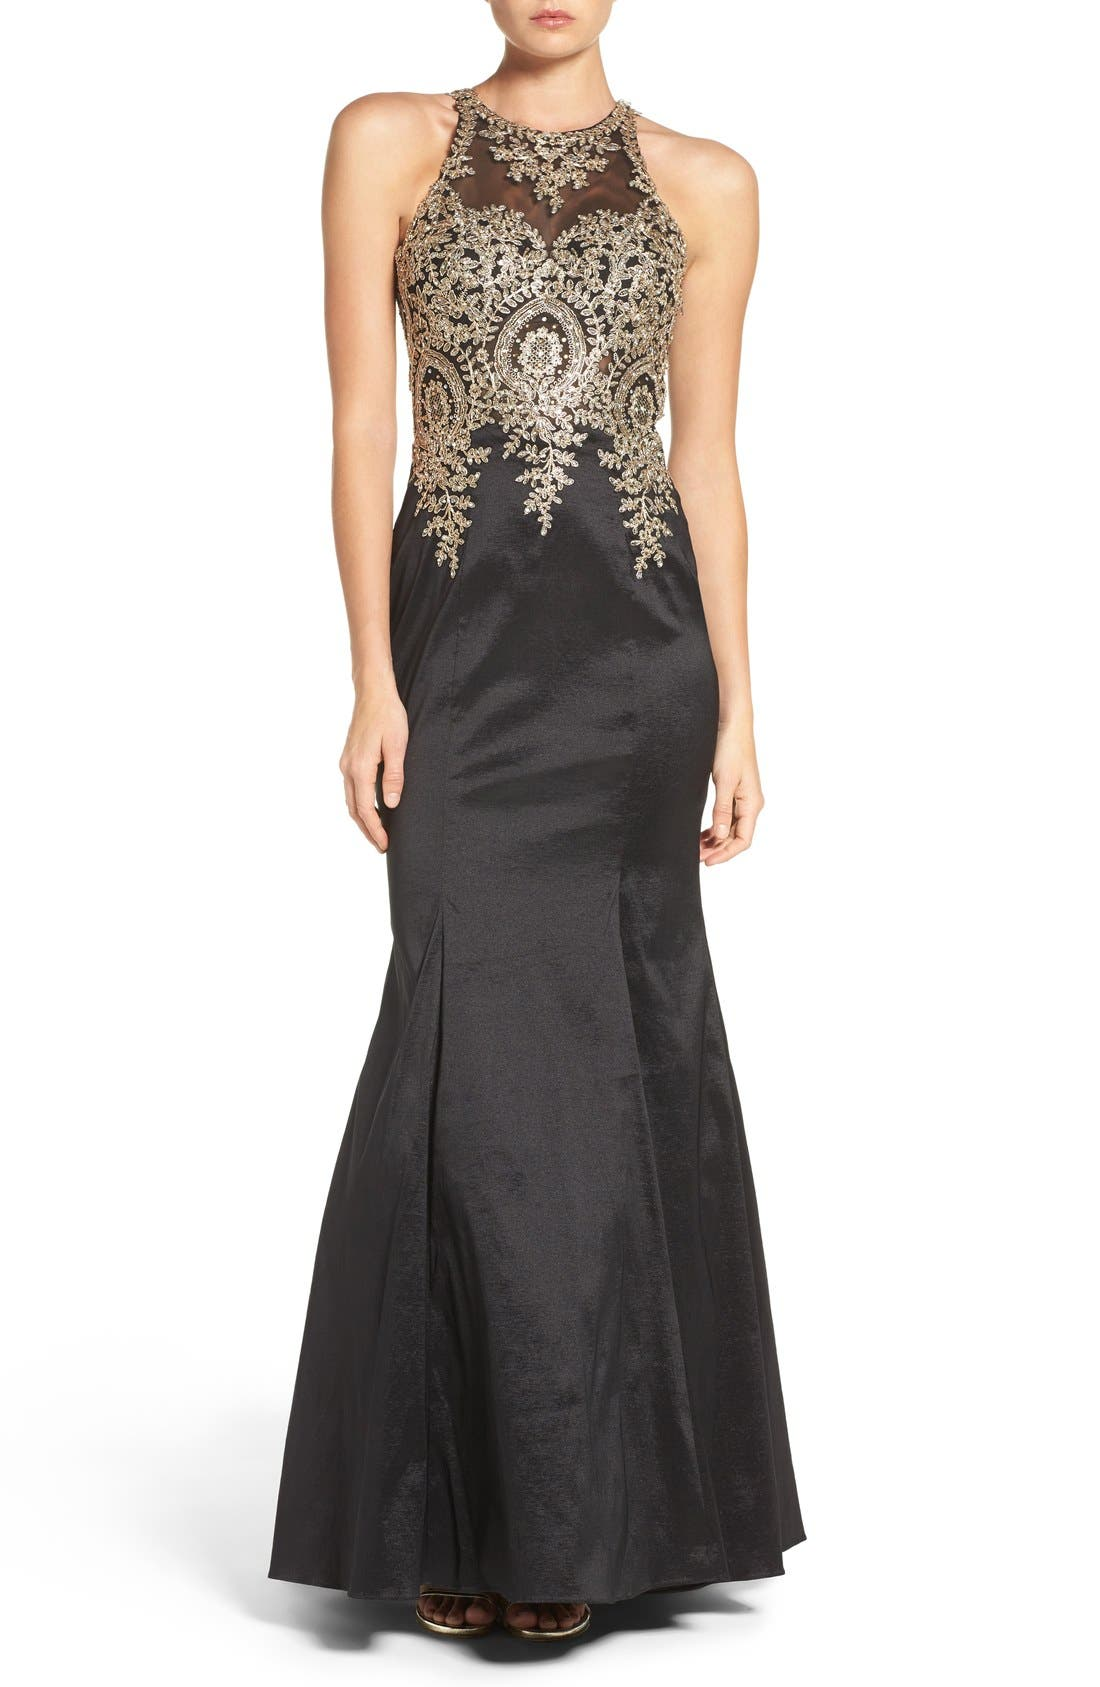 Alternate Image 1 Selected - Xscape Embellished Taffeta Gown (Regular & Petite)